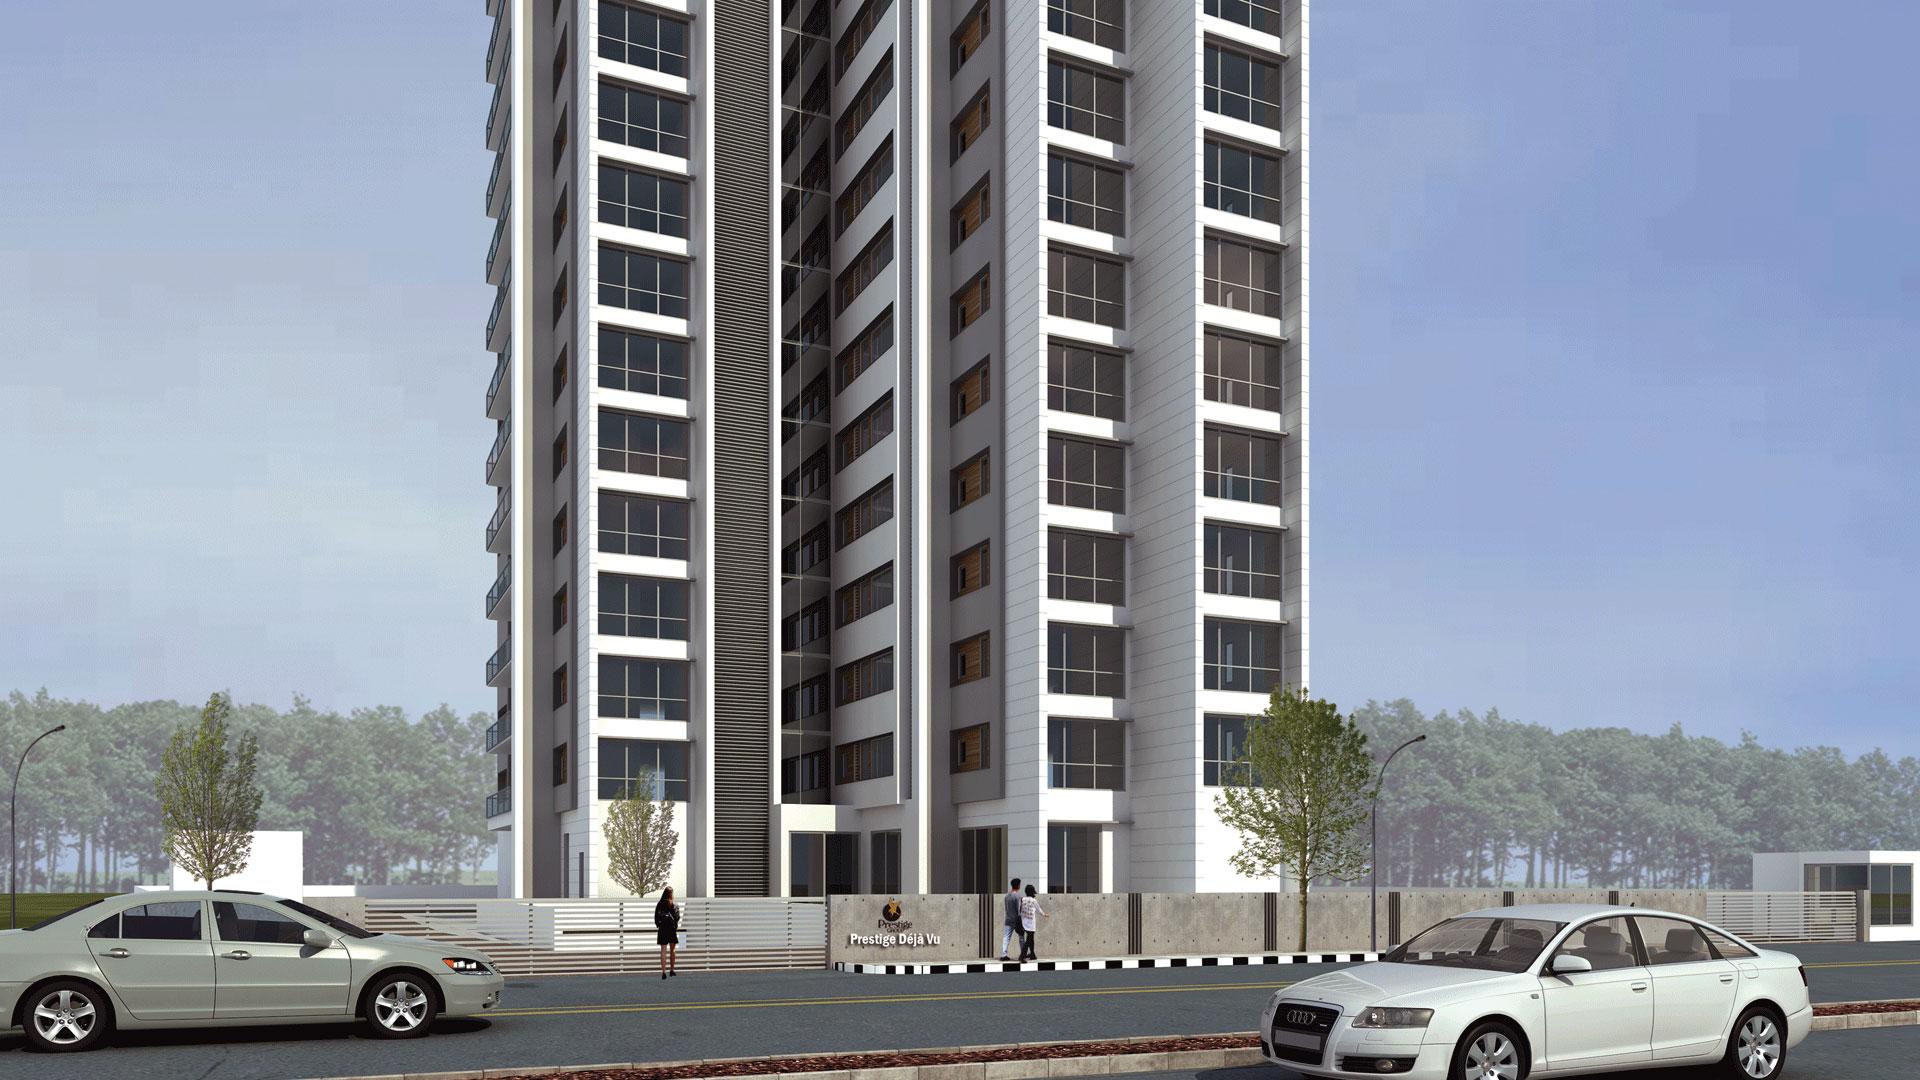 prestige-deja-vu-Apartment-in-pulkeshi-Nagar-Bangalore-Image-01